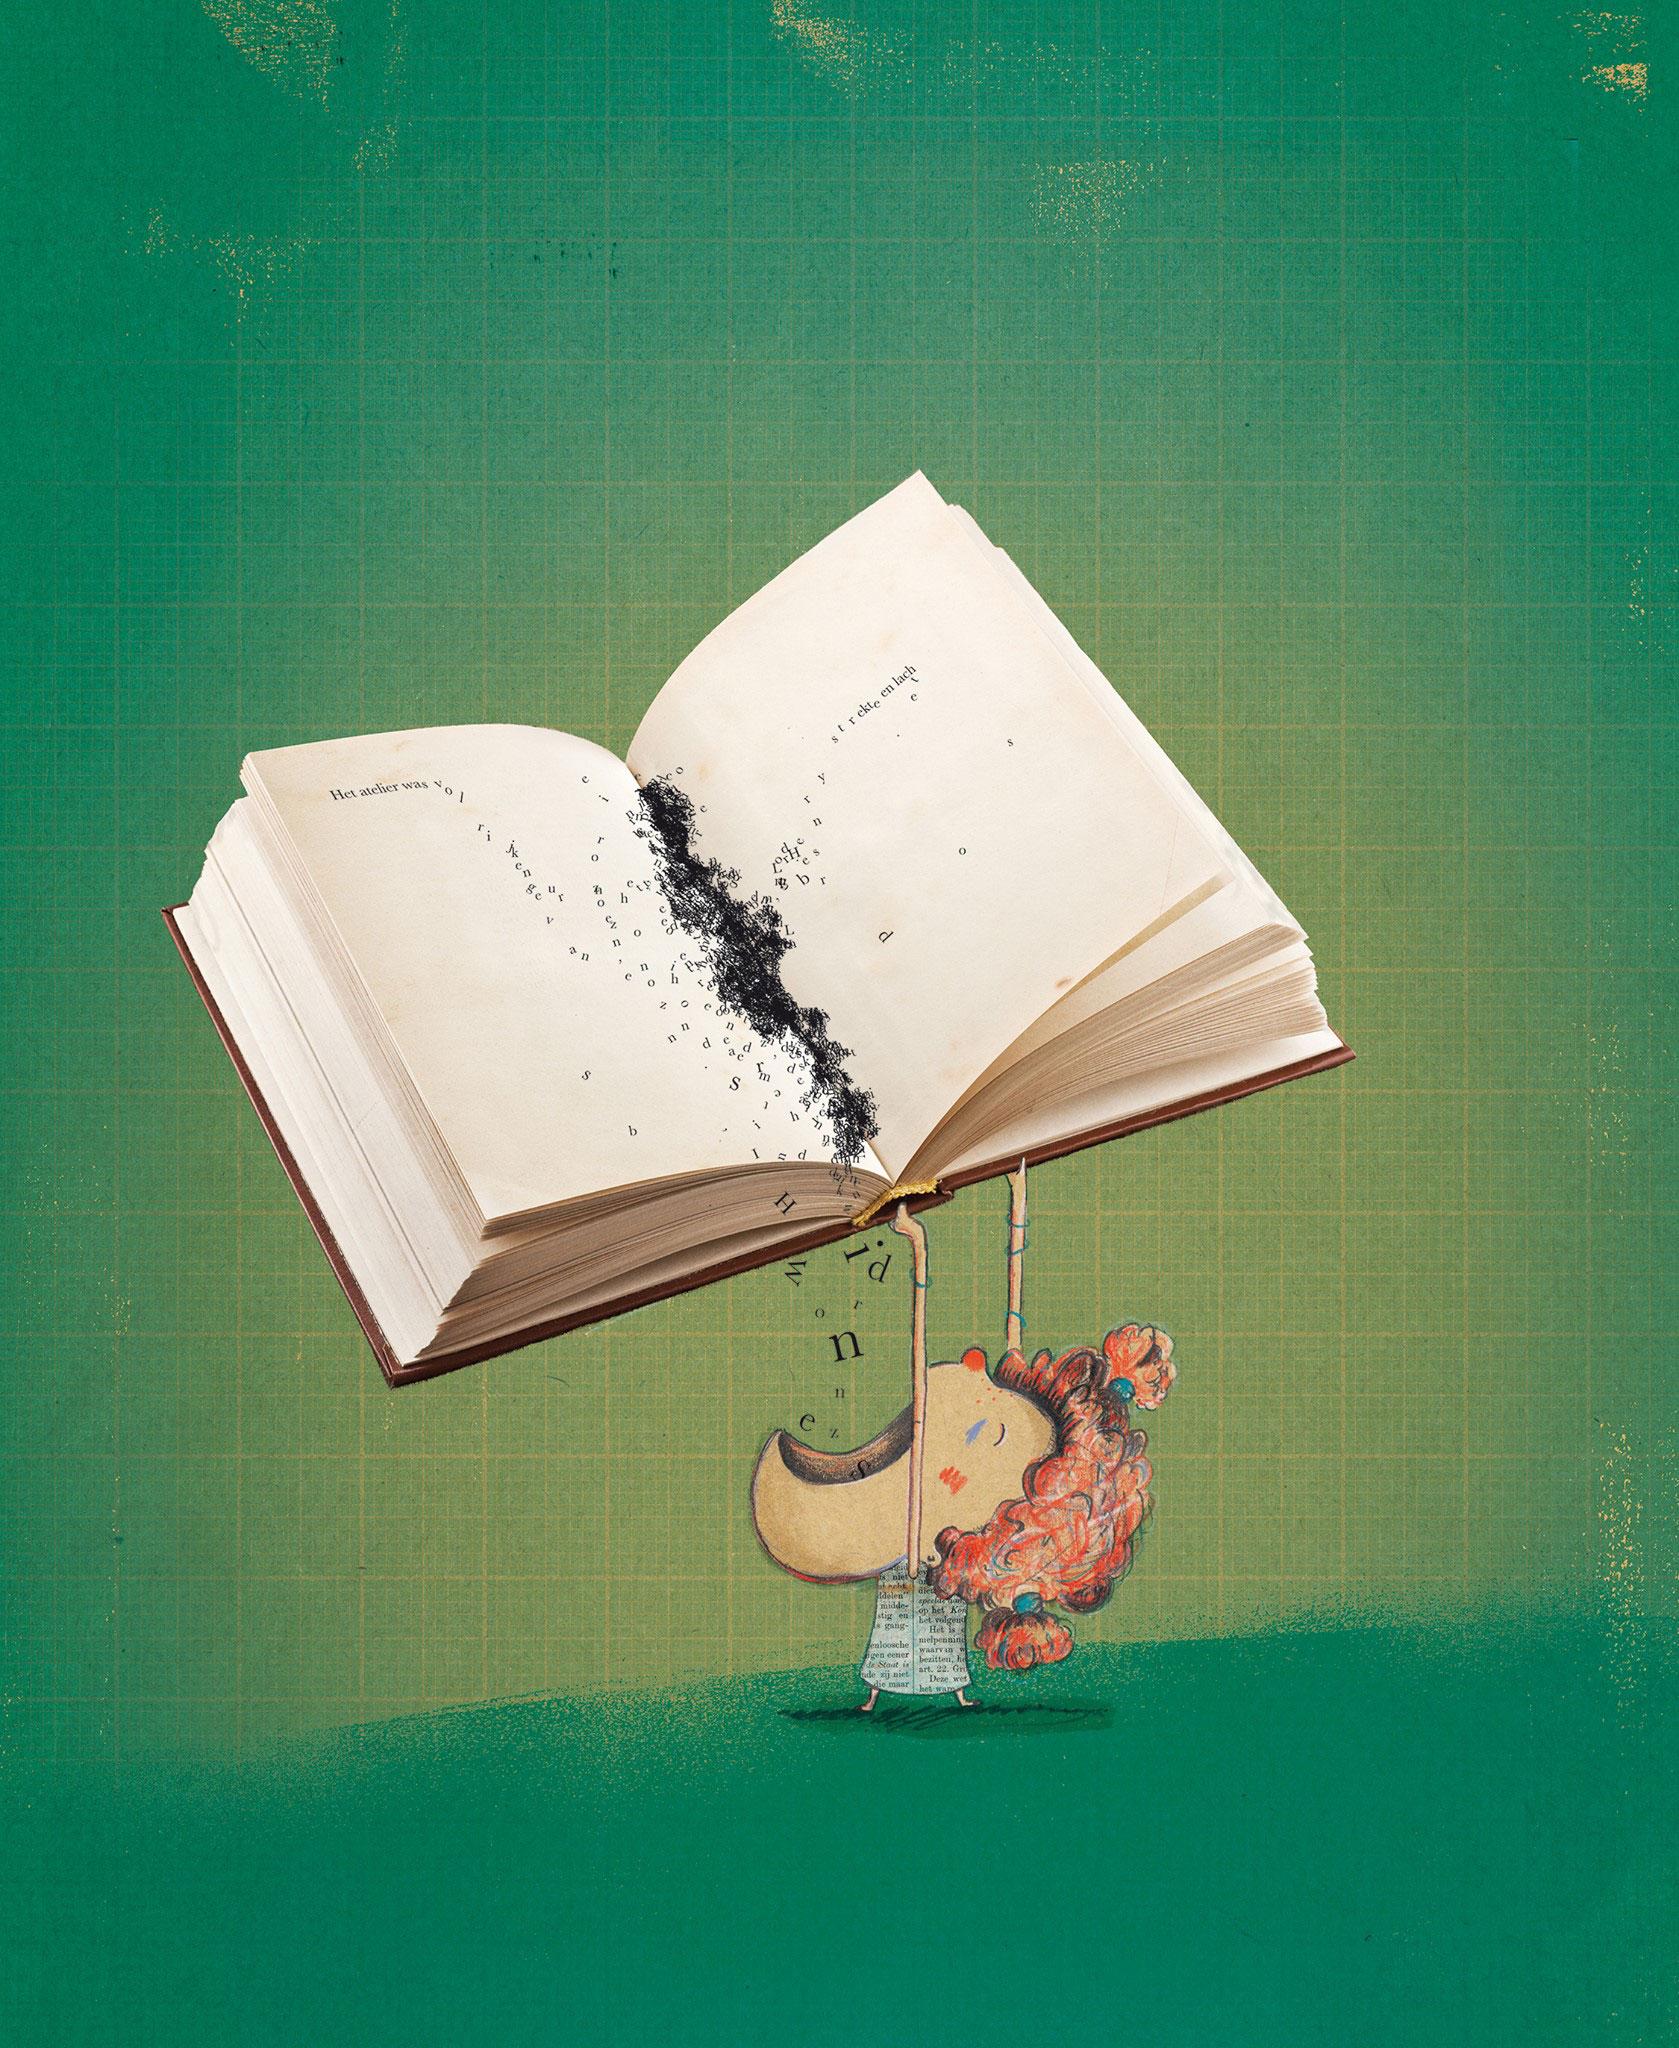 De 'Letterfretter' door illustrator Kristof Devos